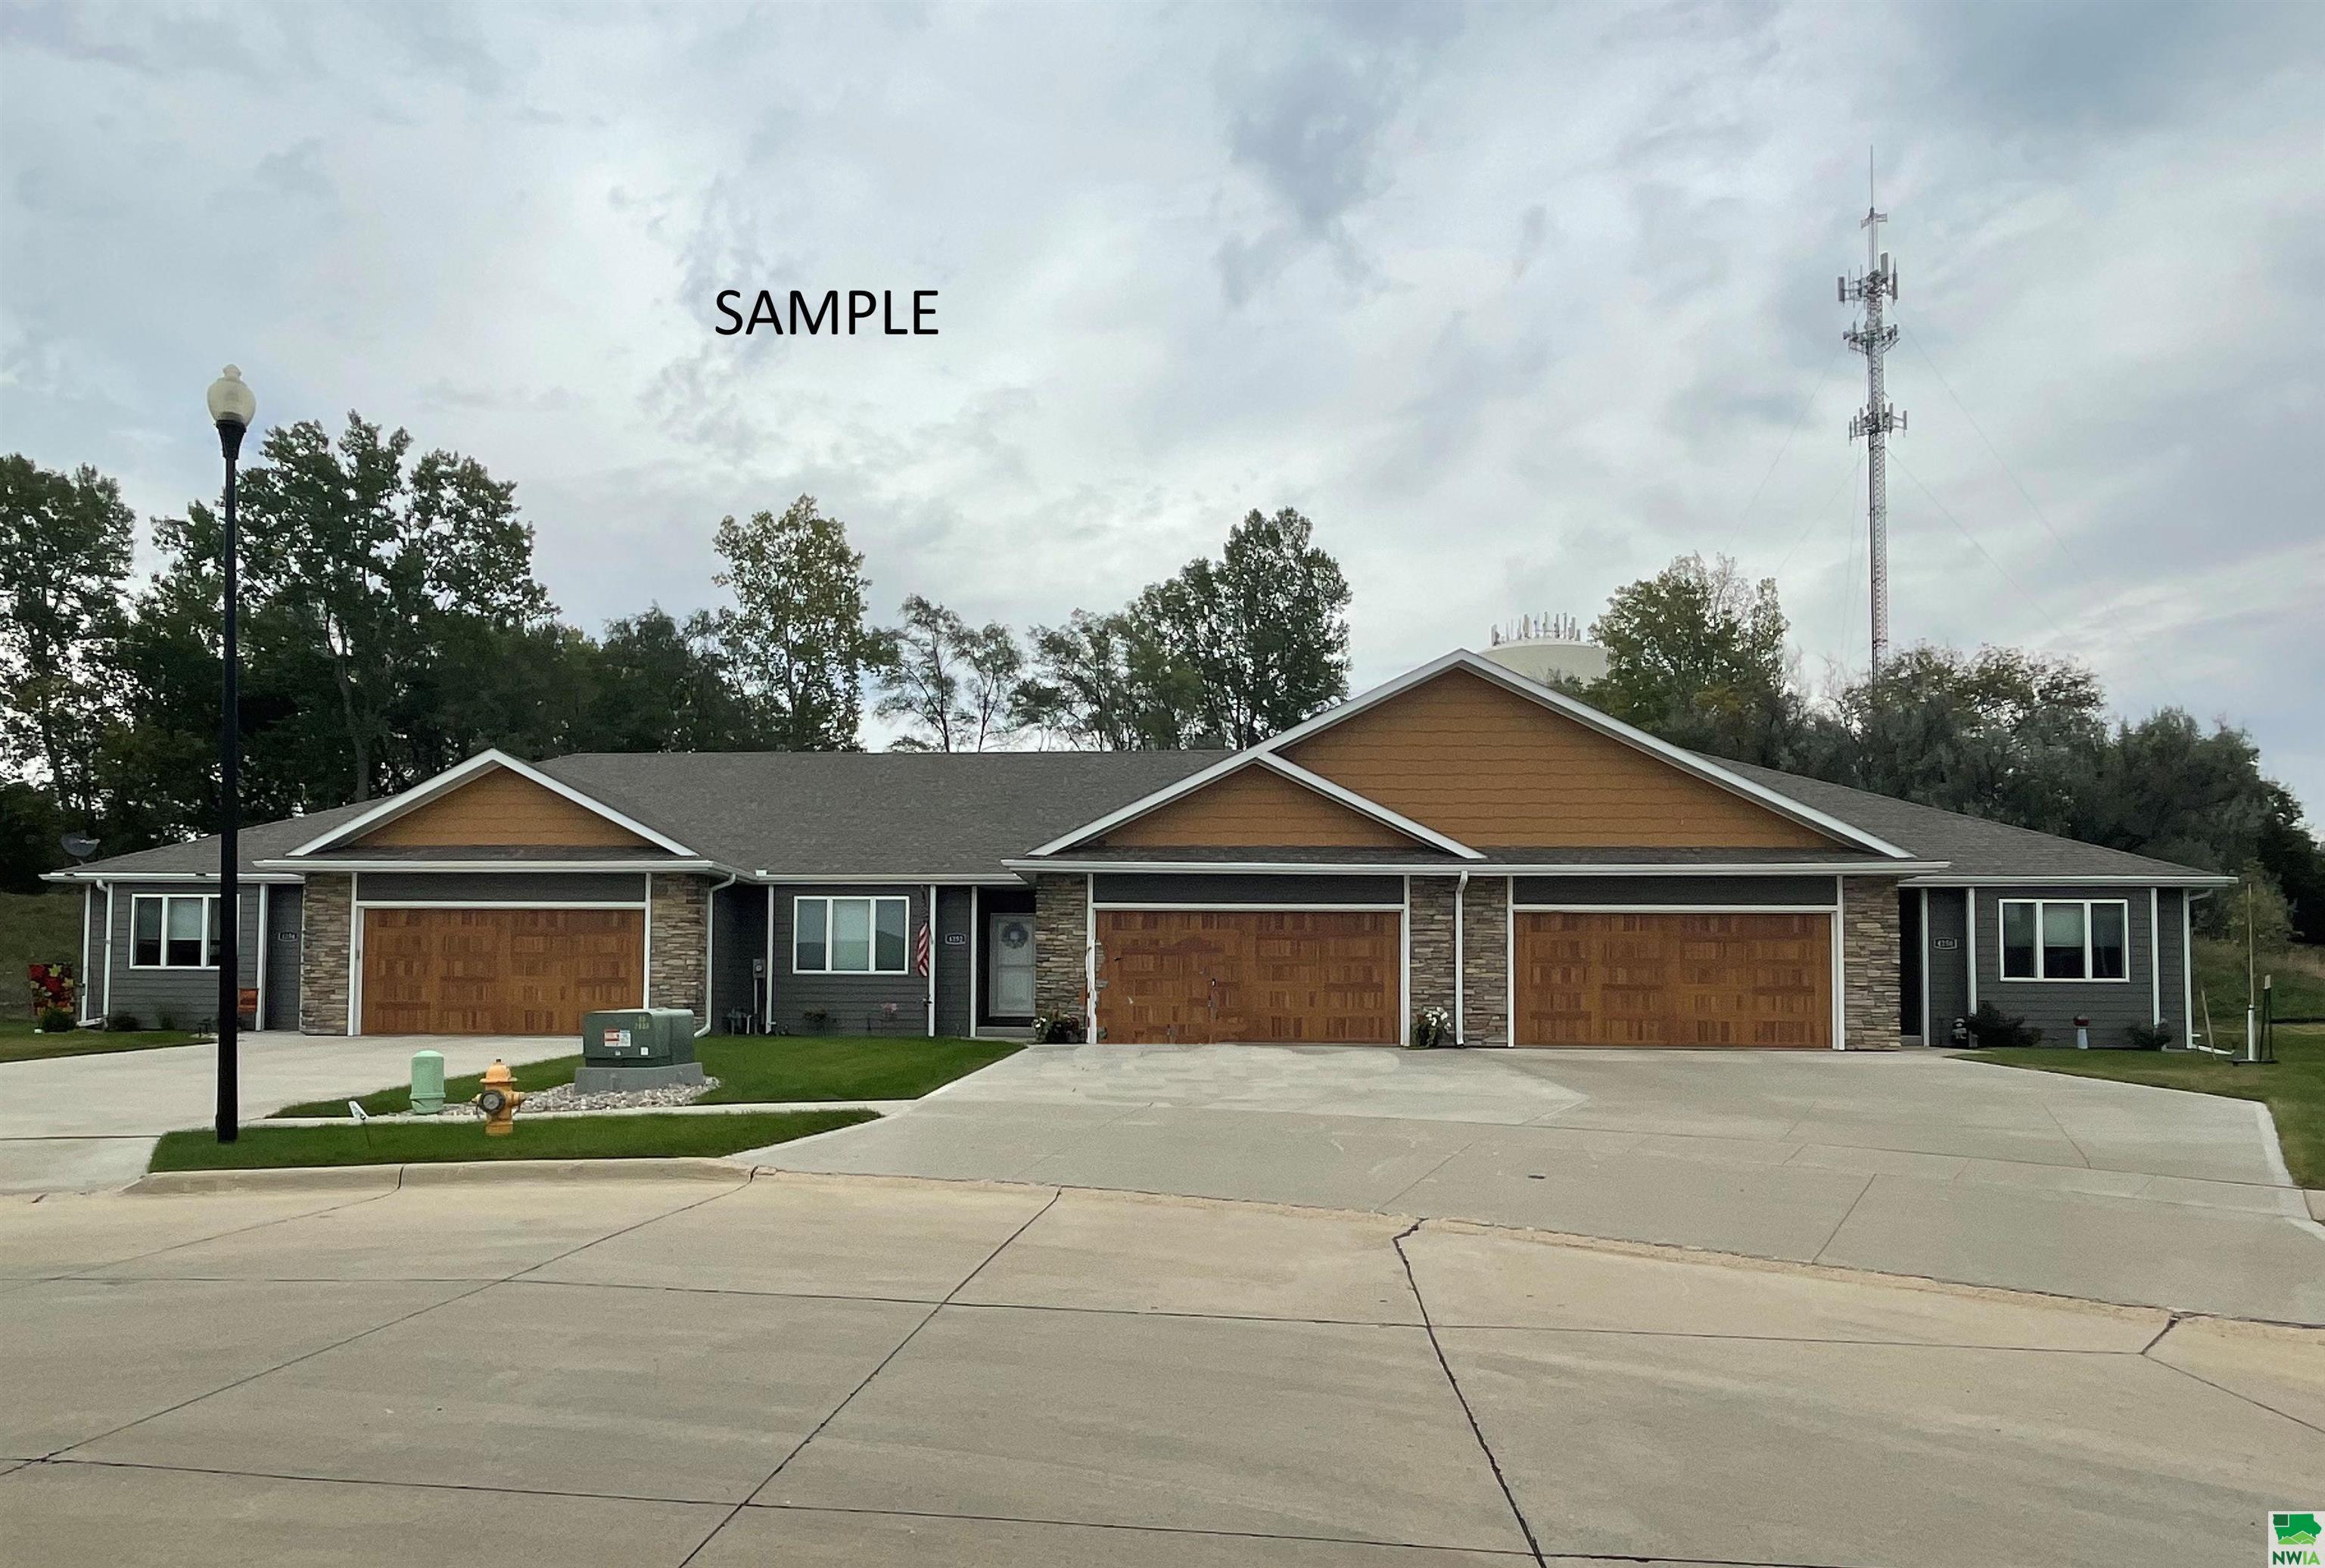 4231 Fremar Drive, Sioux City, Iowa 51104